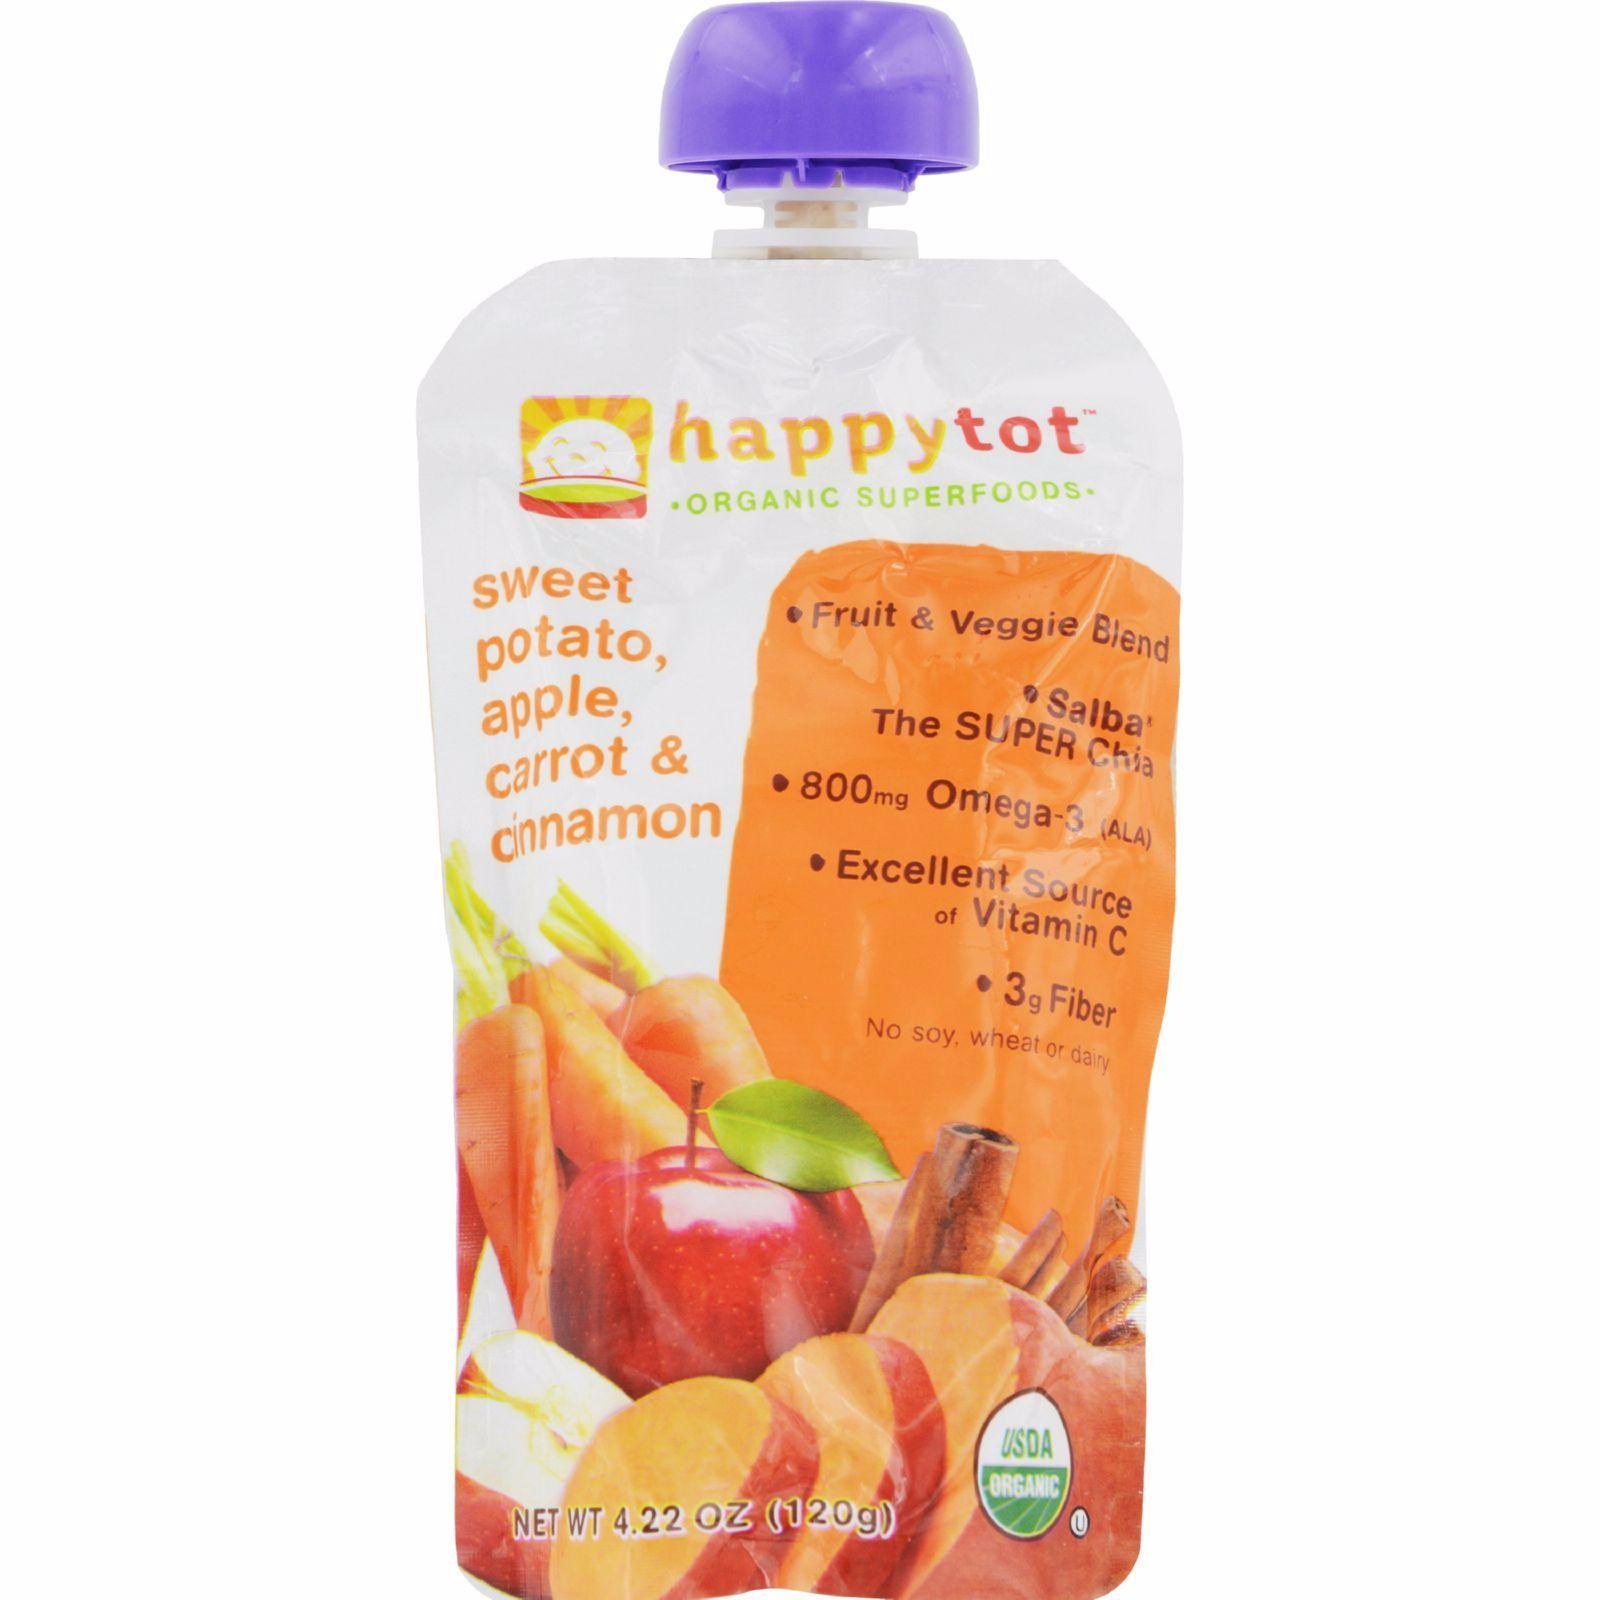 Happy Baby Happytot Organic Superfoods Sweet Potato Apple Carrot And Cinnamon - 4.22 Oz - Pack of 16